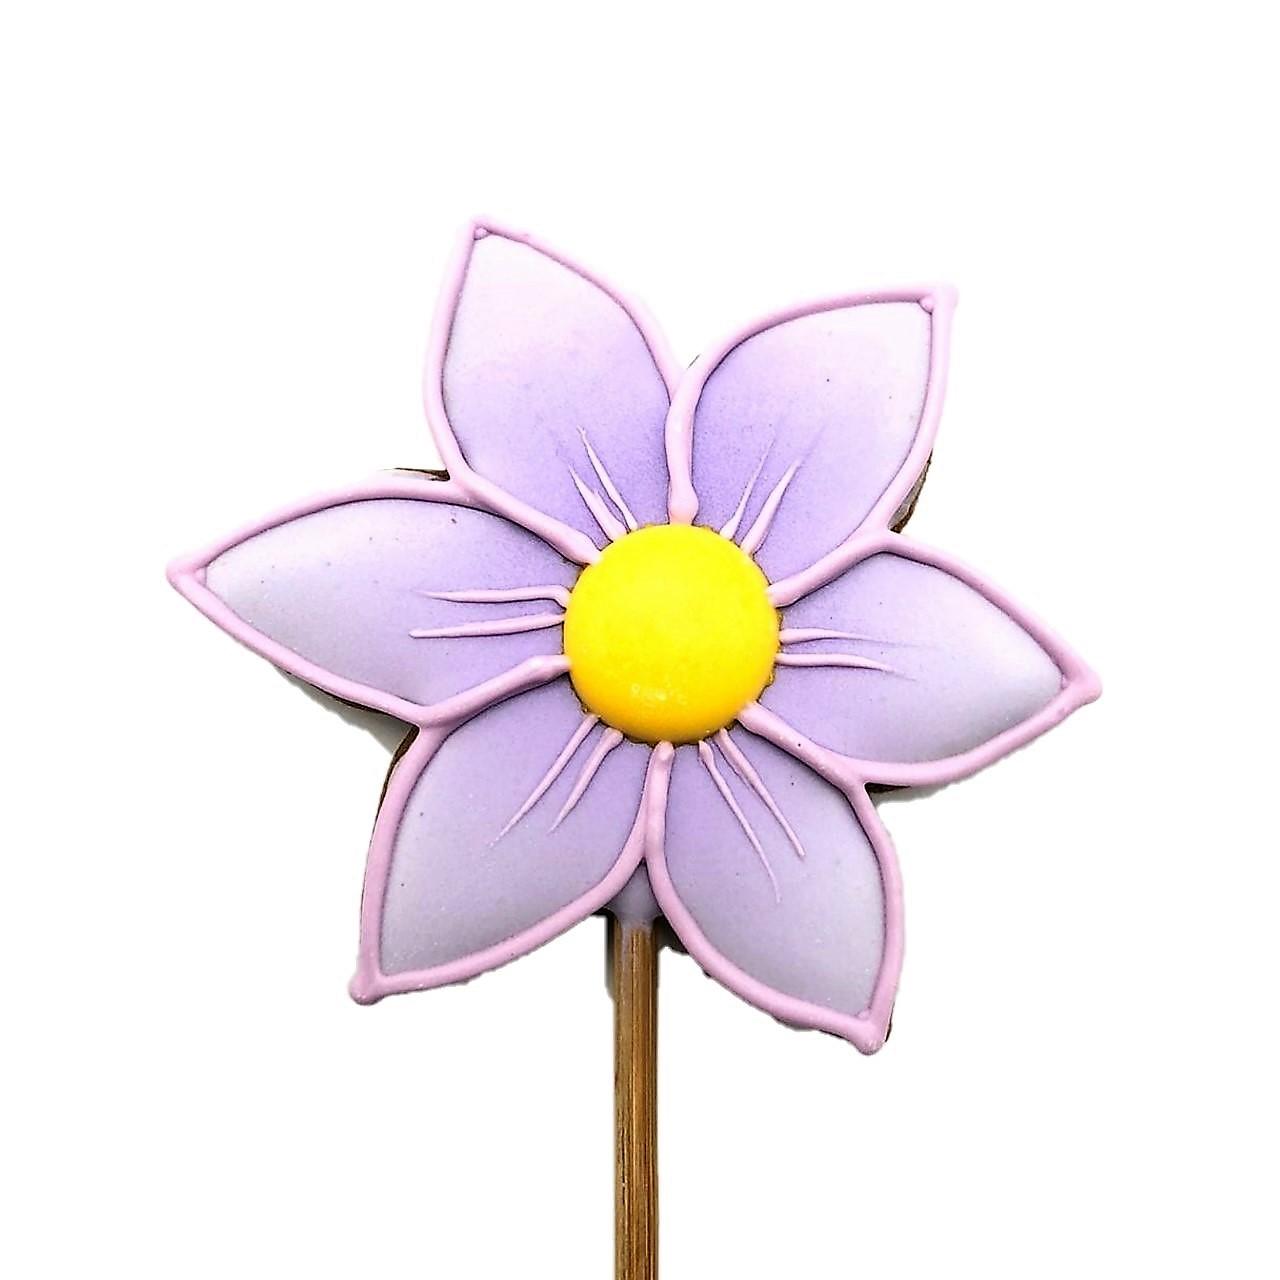 Pirulito Bolacha de Mel - Flor Lilás P